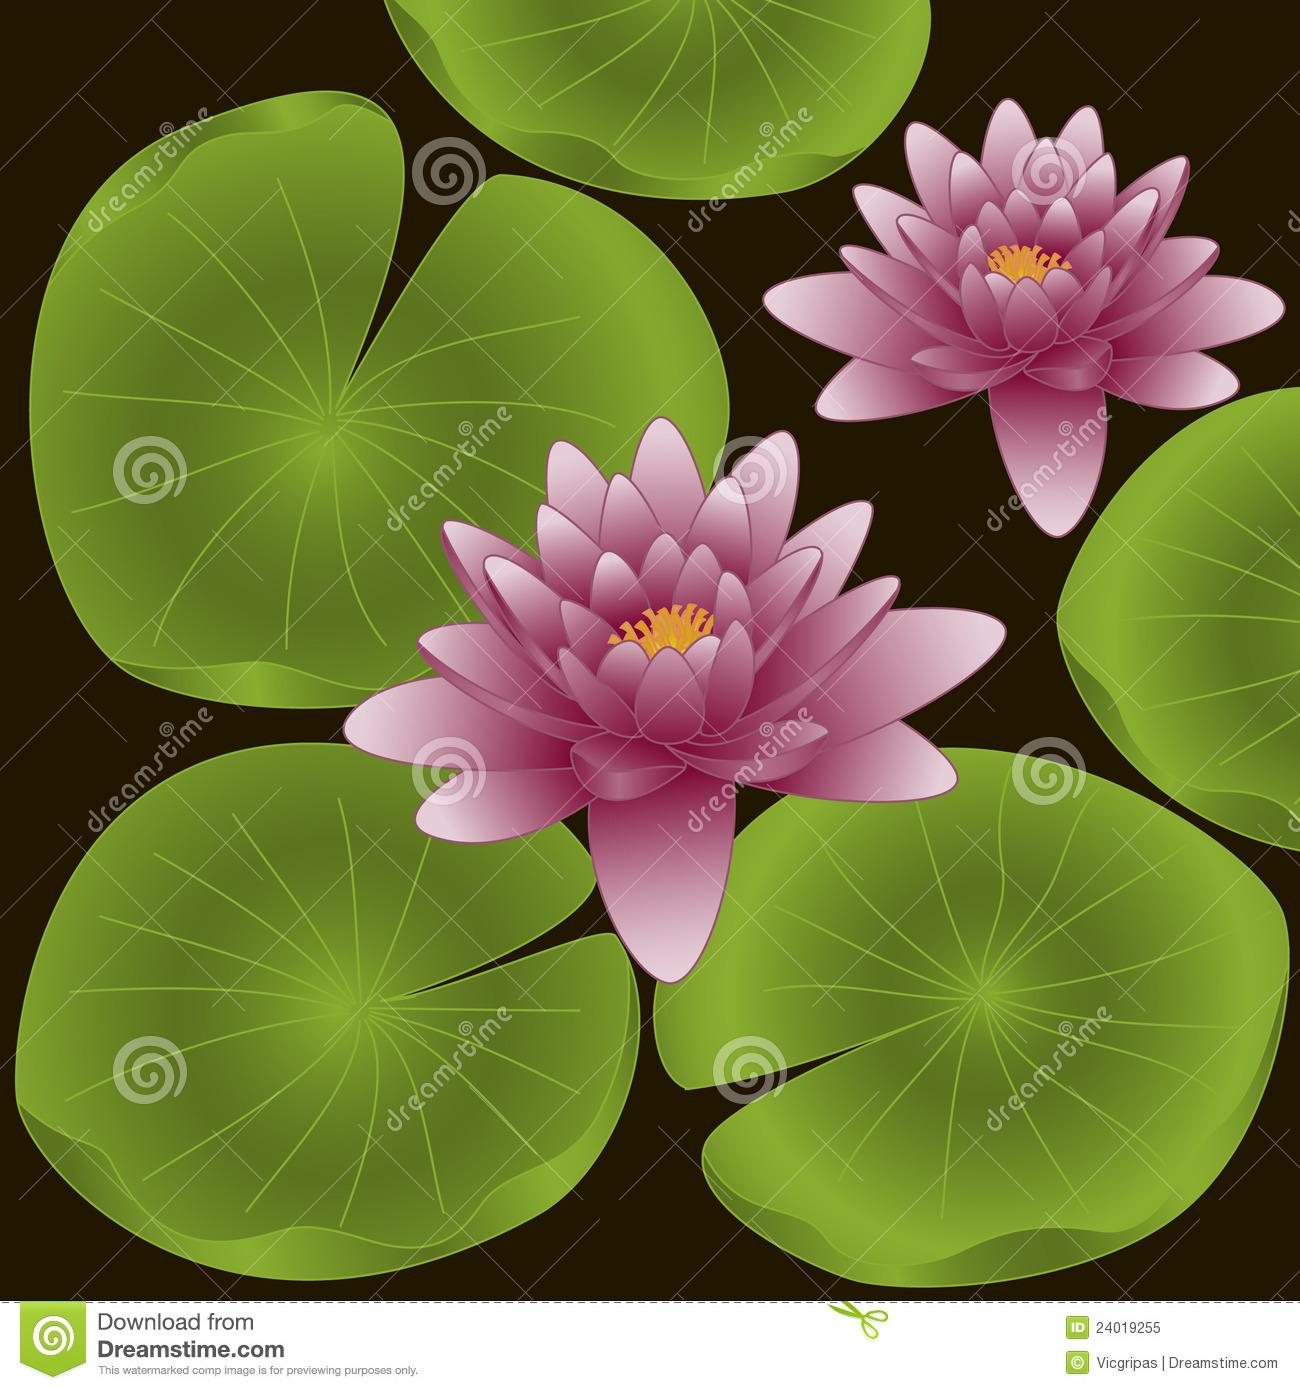 Lotus Flowers. Vector Illustration Royalty Free Stock Photo.